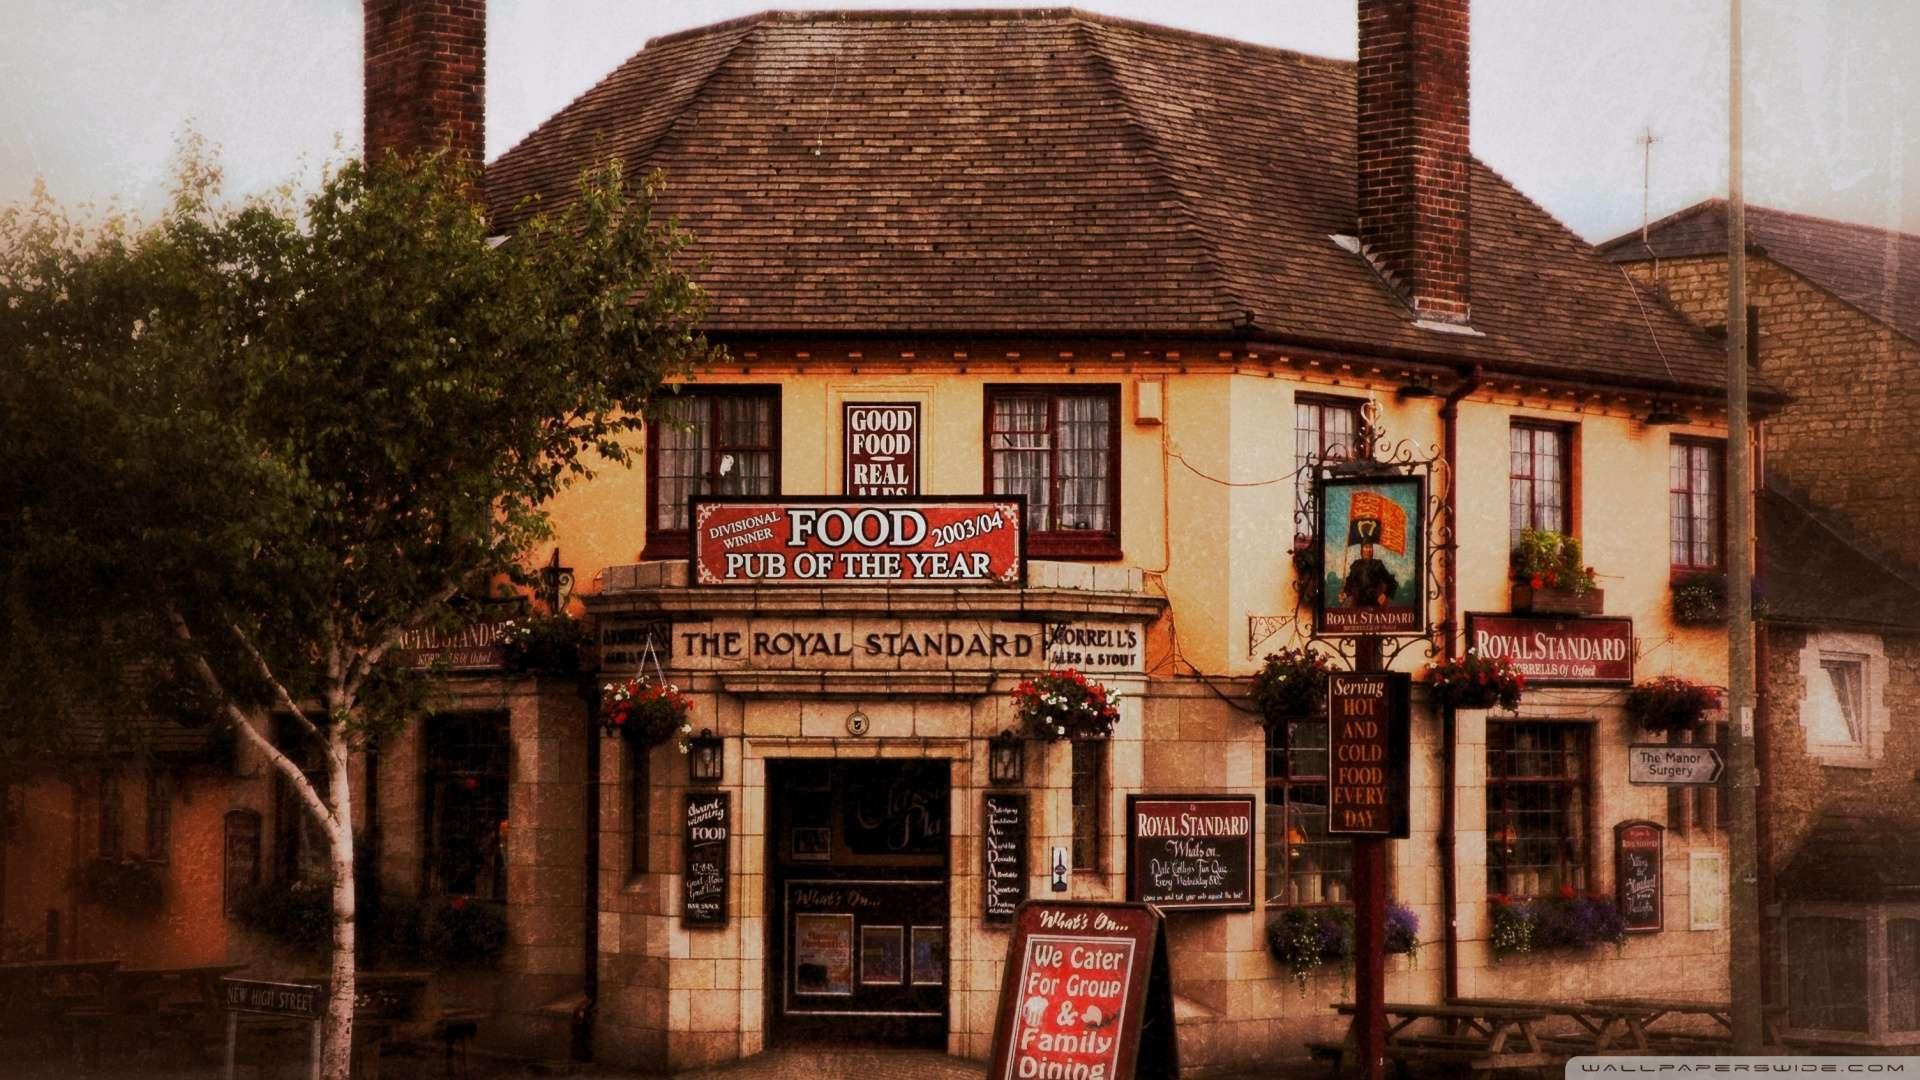 Wallpaper Old English Pub Wallpaper 1080p HD Upload at February 26 1920x1080